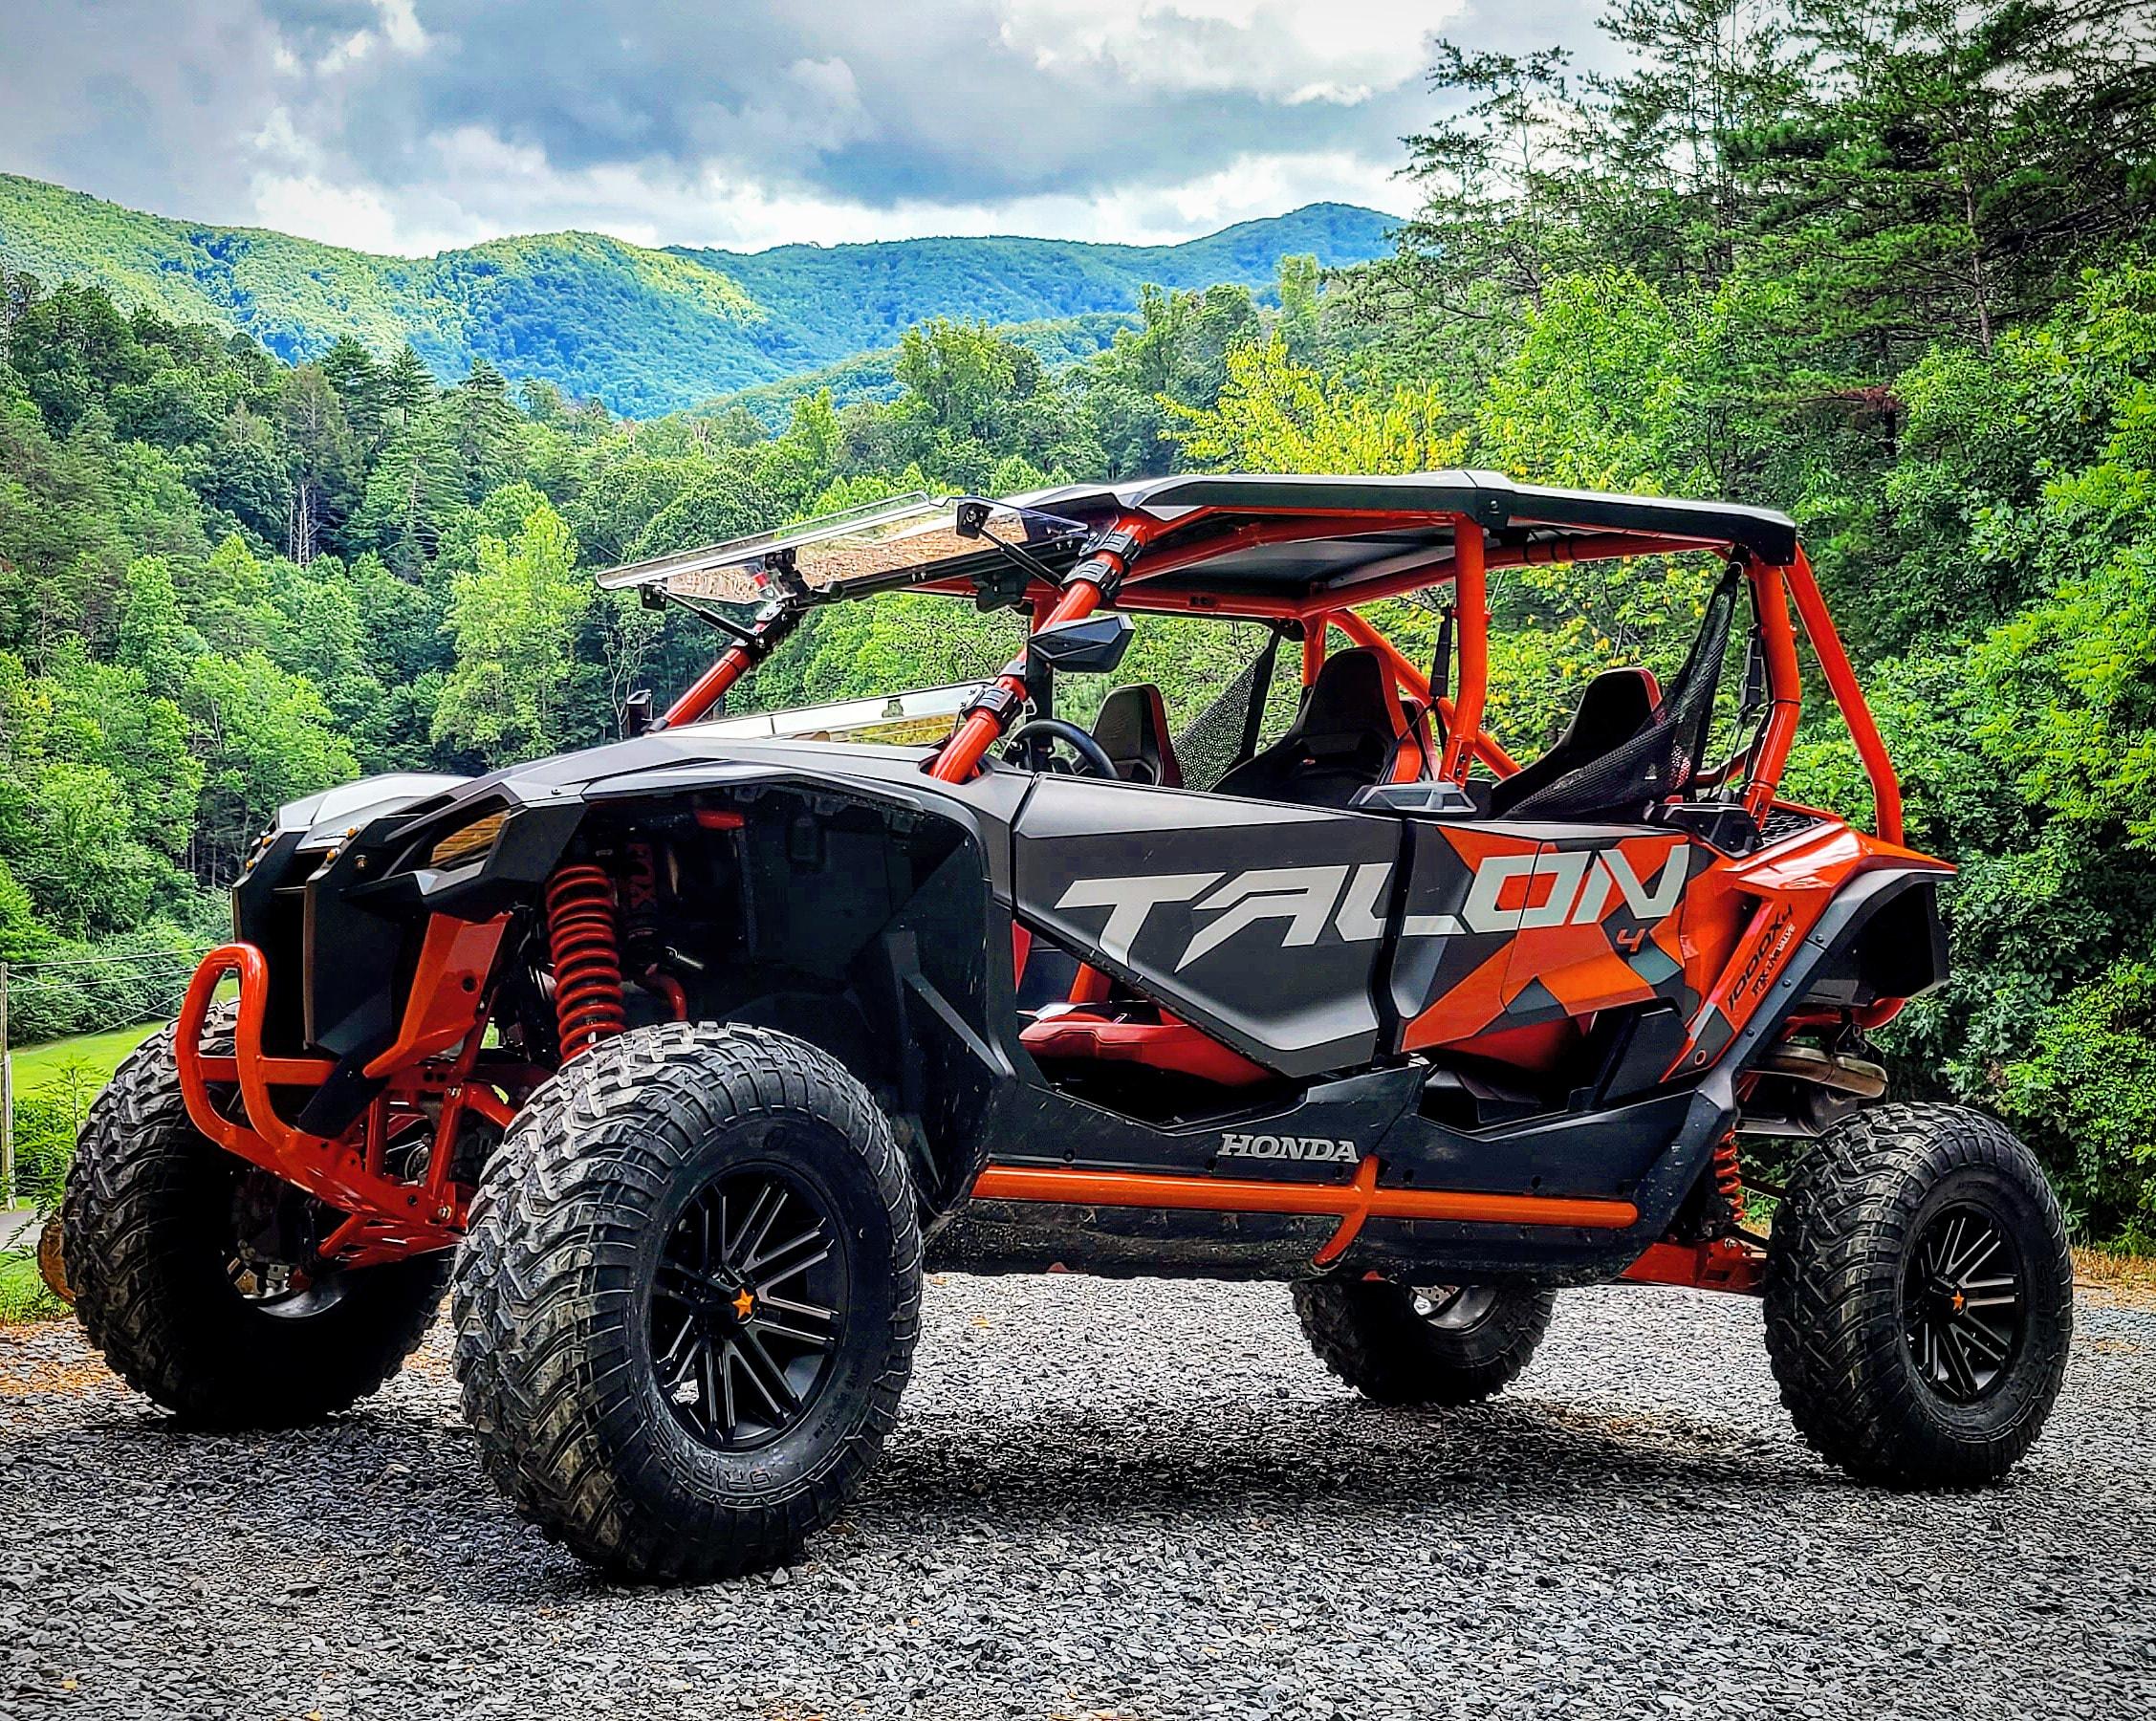 Smoky Mountain Adventure Rentals 3